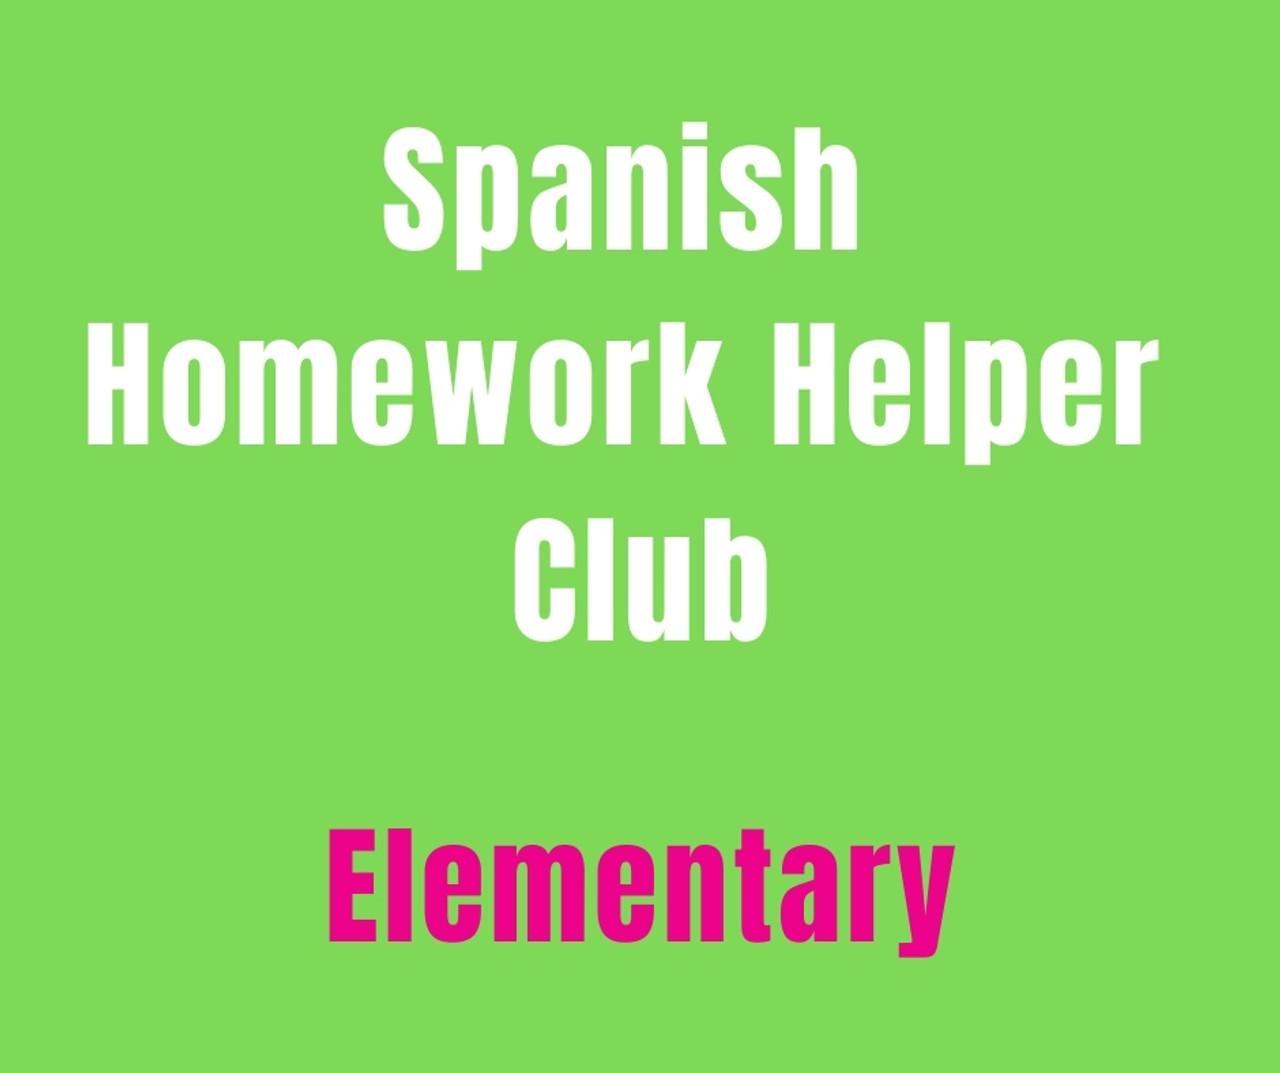 SPANISH HOMEWORK HELPER CLUB (K-5) ELEMENTARY *LIMITED AVAILABILITY